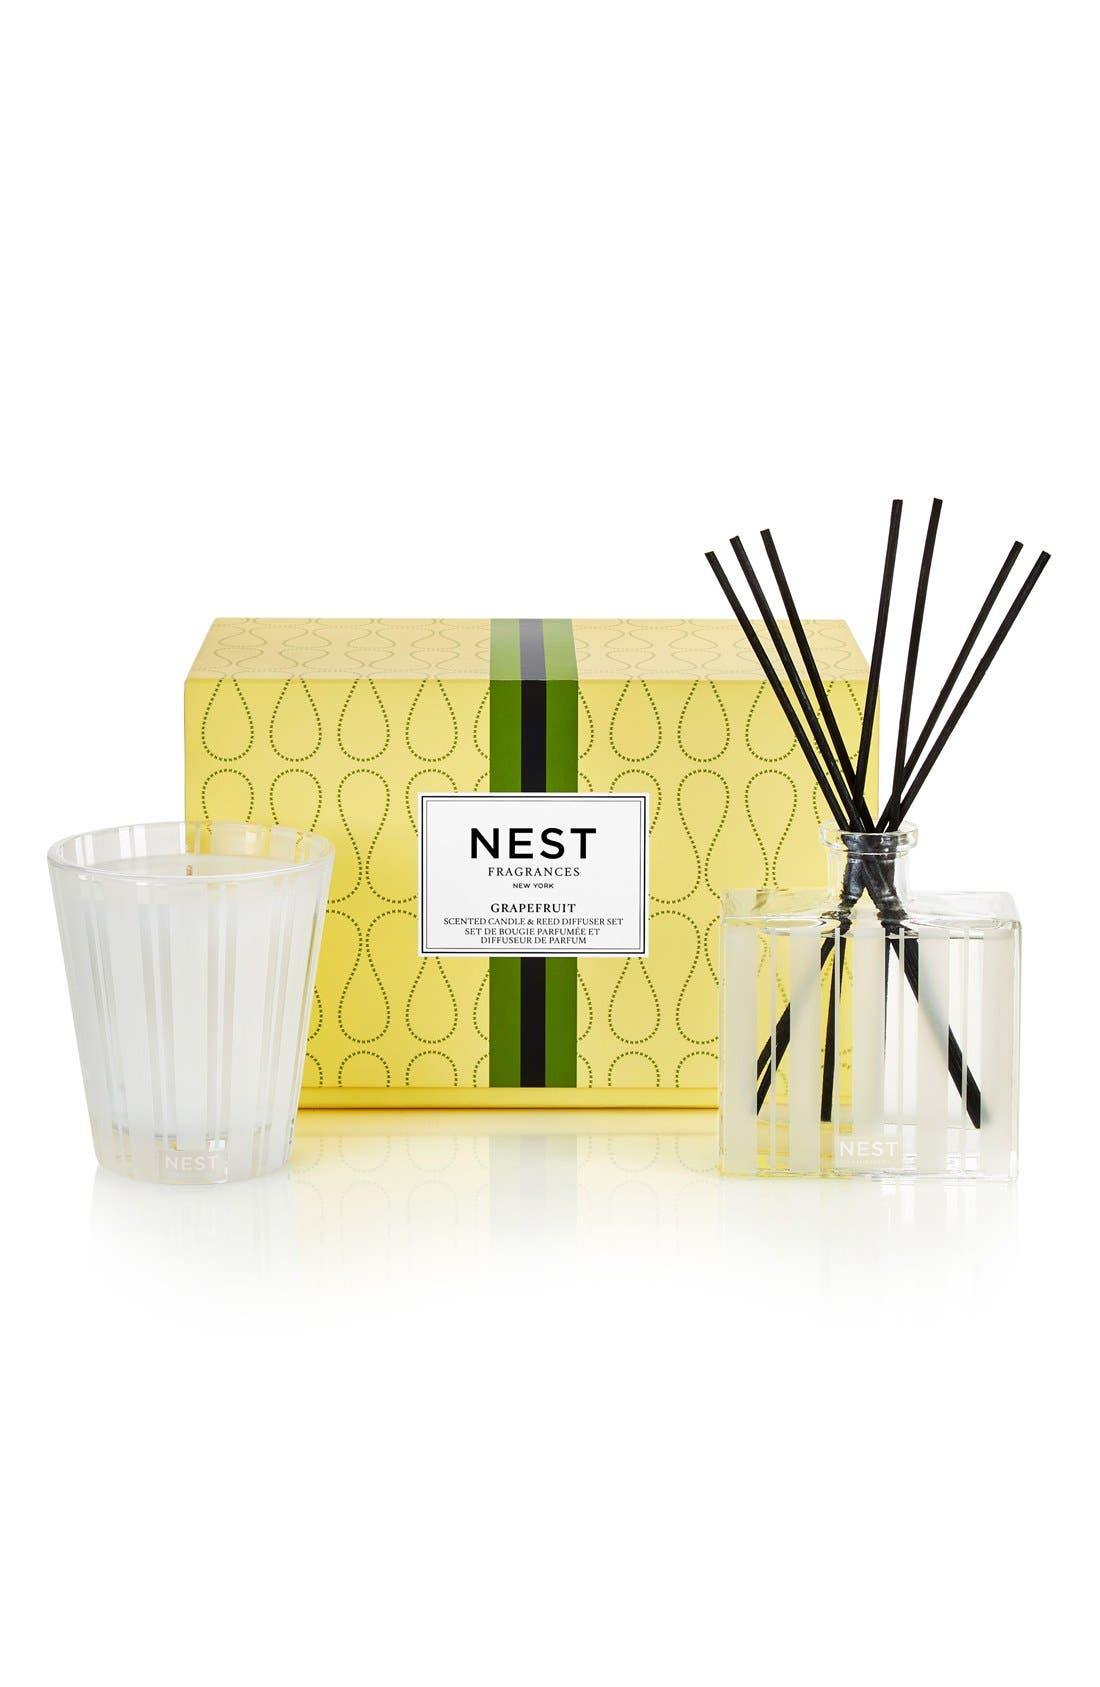 NEST FRAGRANCES 'Grapefruit' Reed Diffuser & Candle Set, Main, color, 000